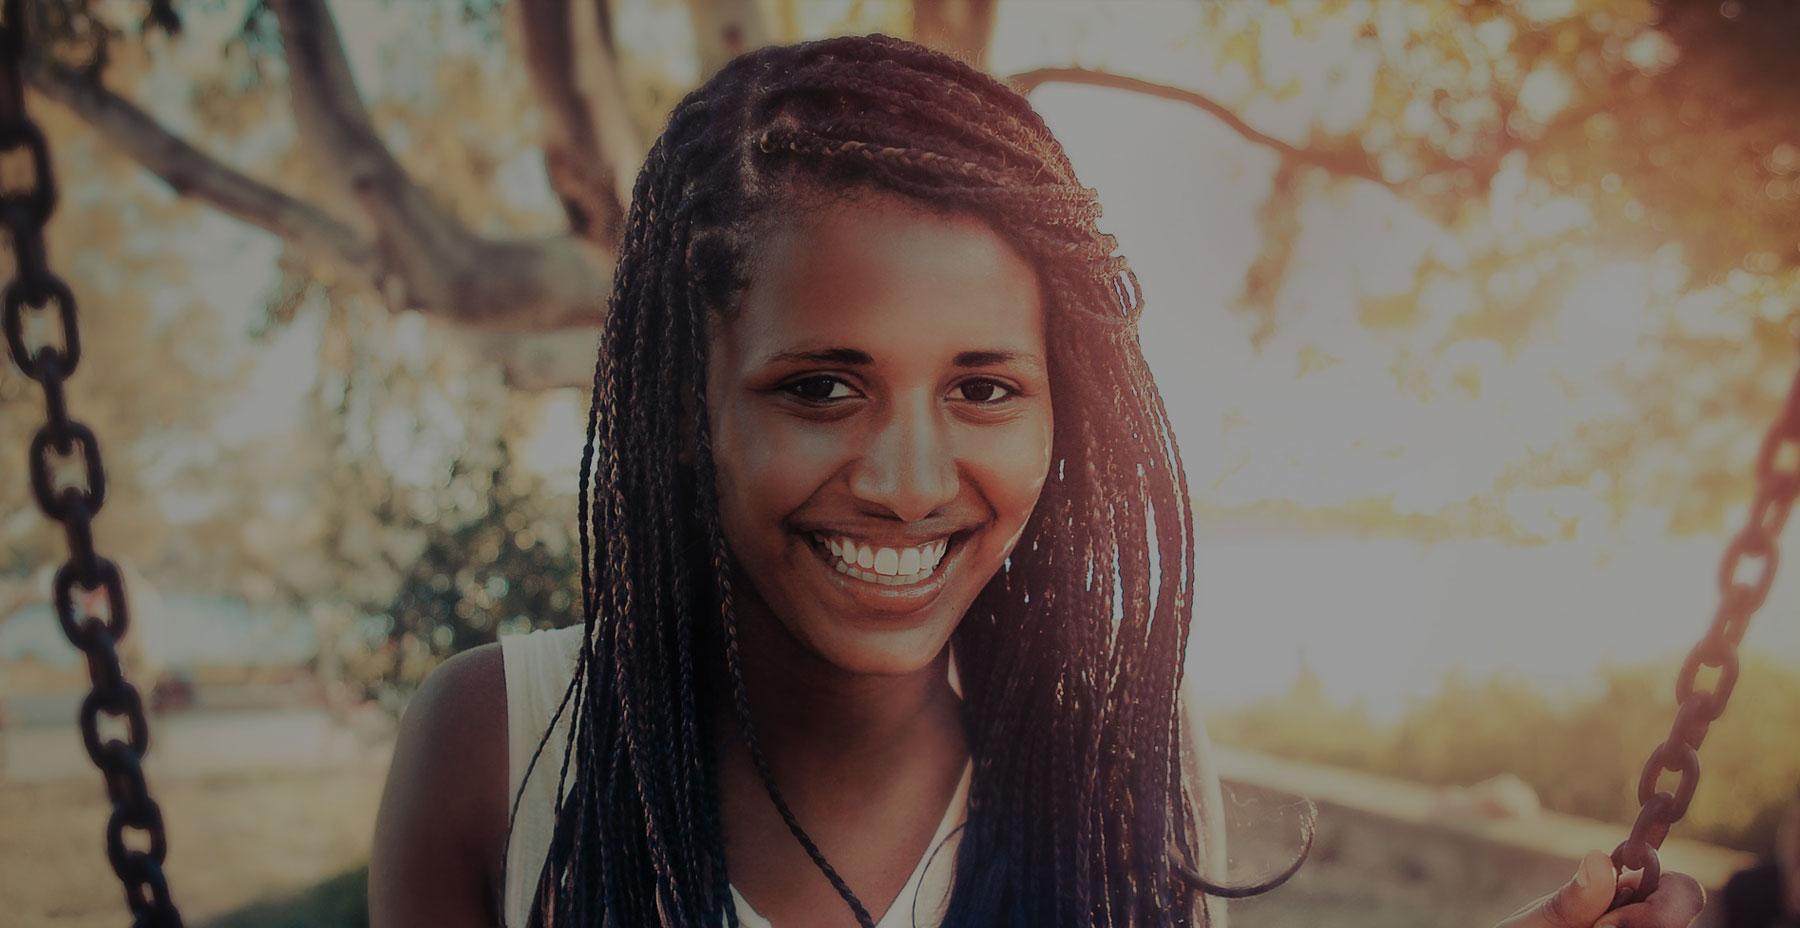 Hortycelia I Coiffeur Visagiste Afro Europeen A Paris